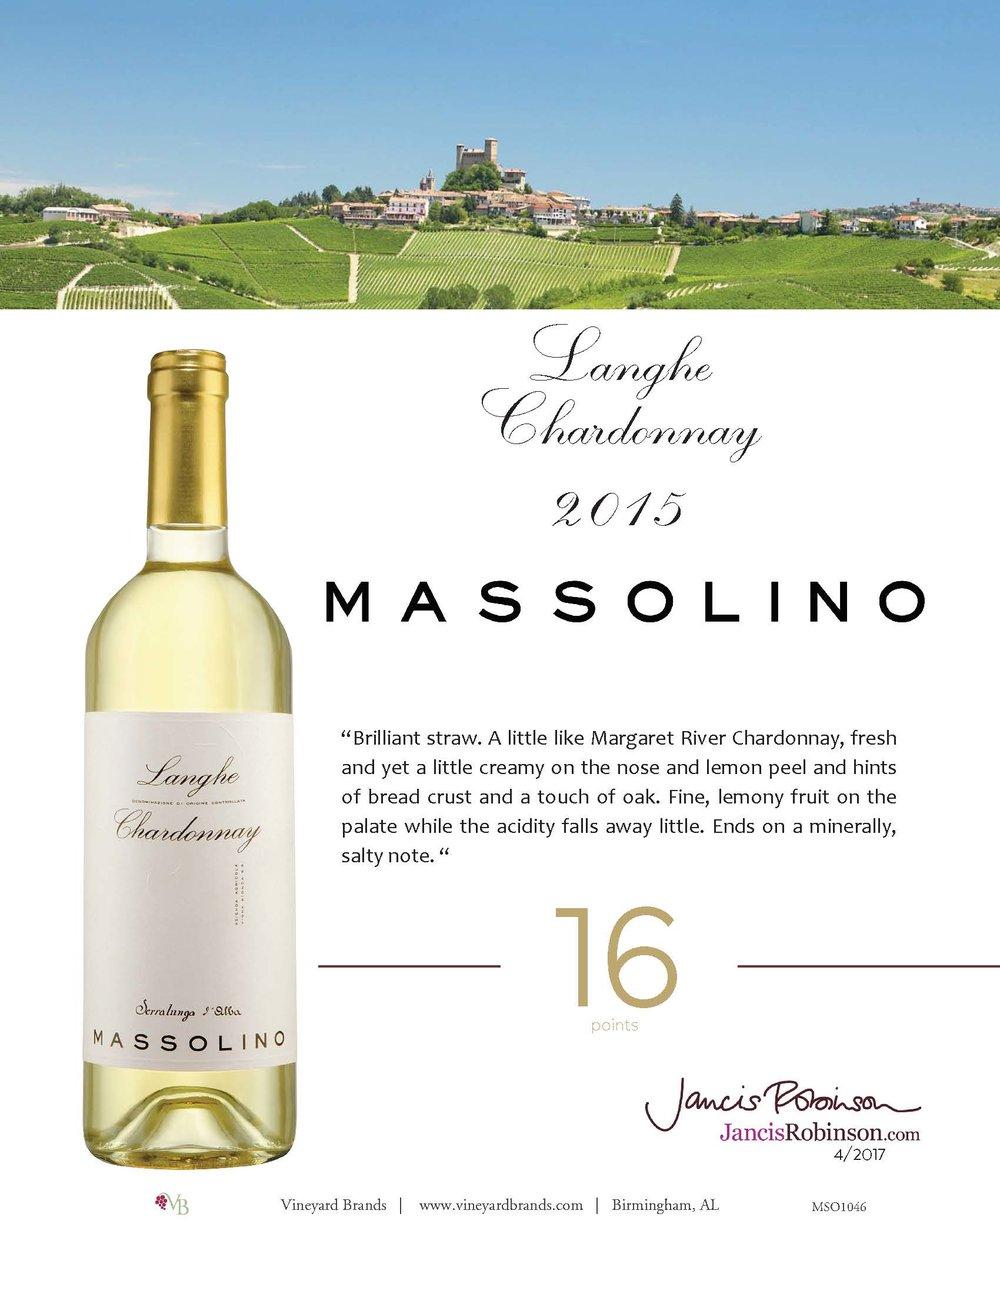 Massolino Langhe Chardonnay 2015.jpg